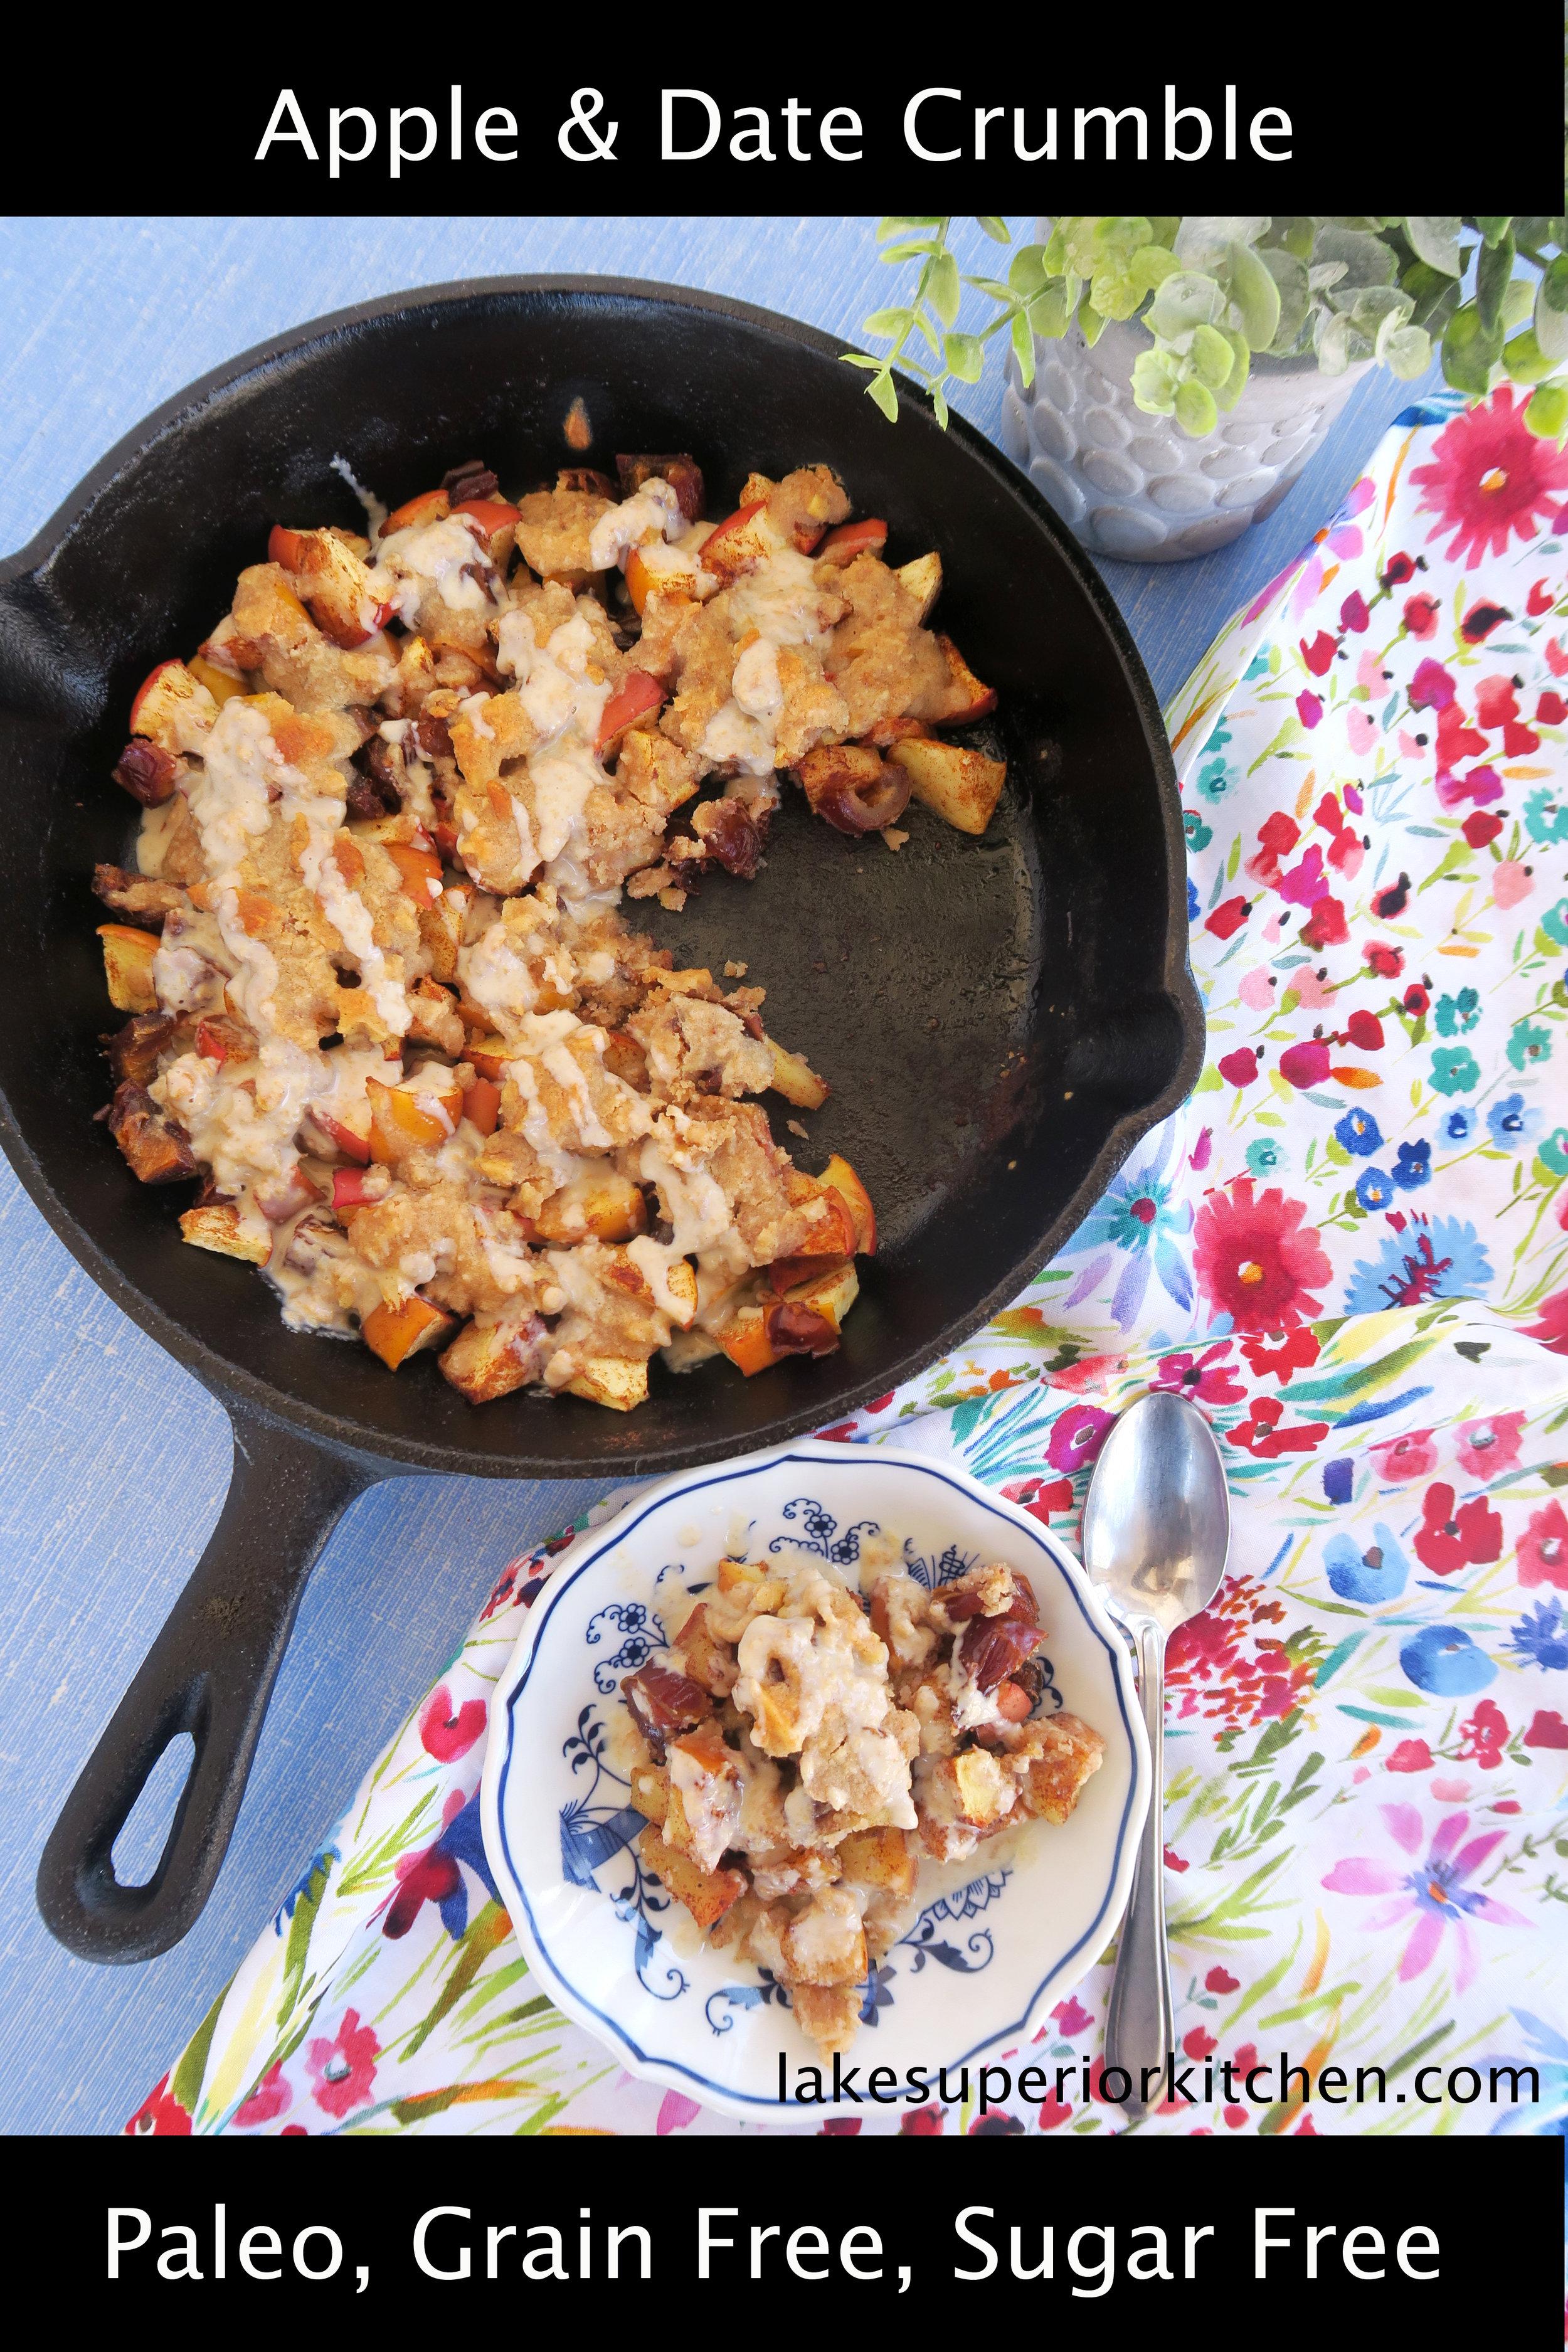 paleo, paleo recipe, apple crisp, apple crumble, healthy dessert, paleo dessert, date recipe, apple recipe, healthy, lake superior kitchen